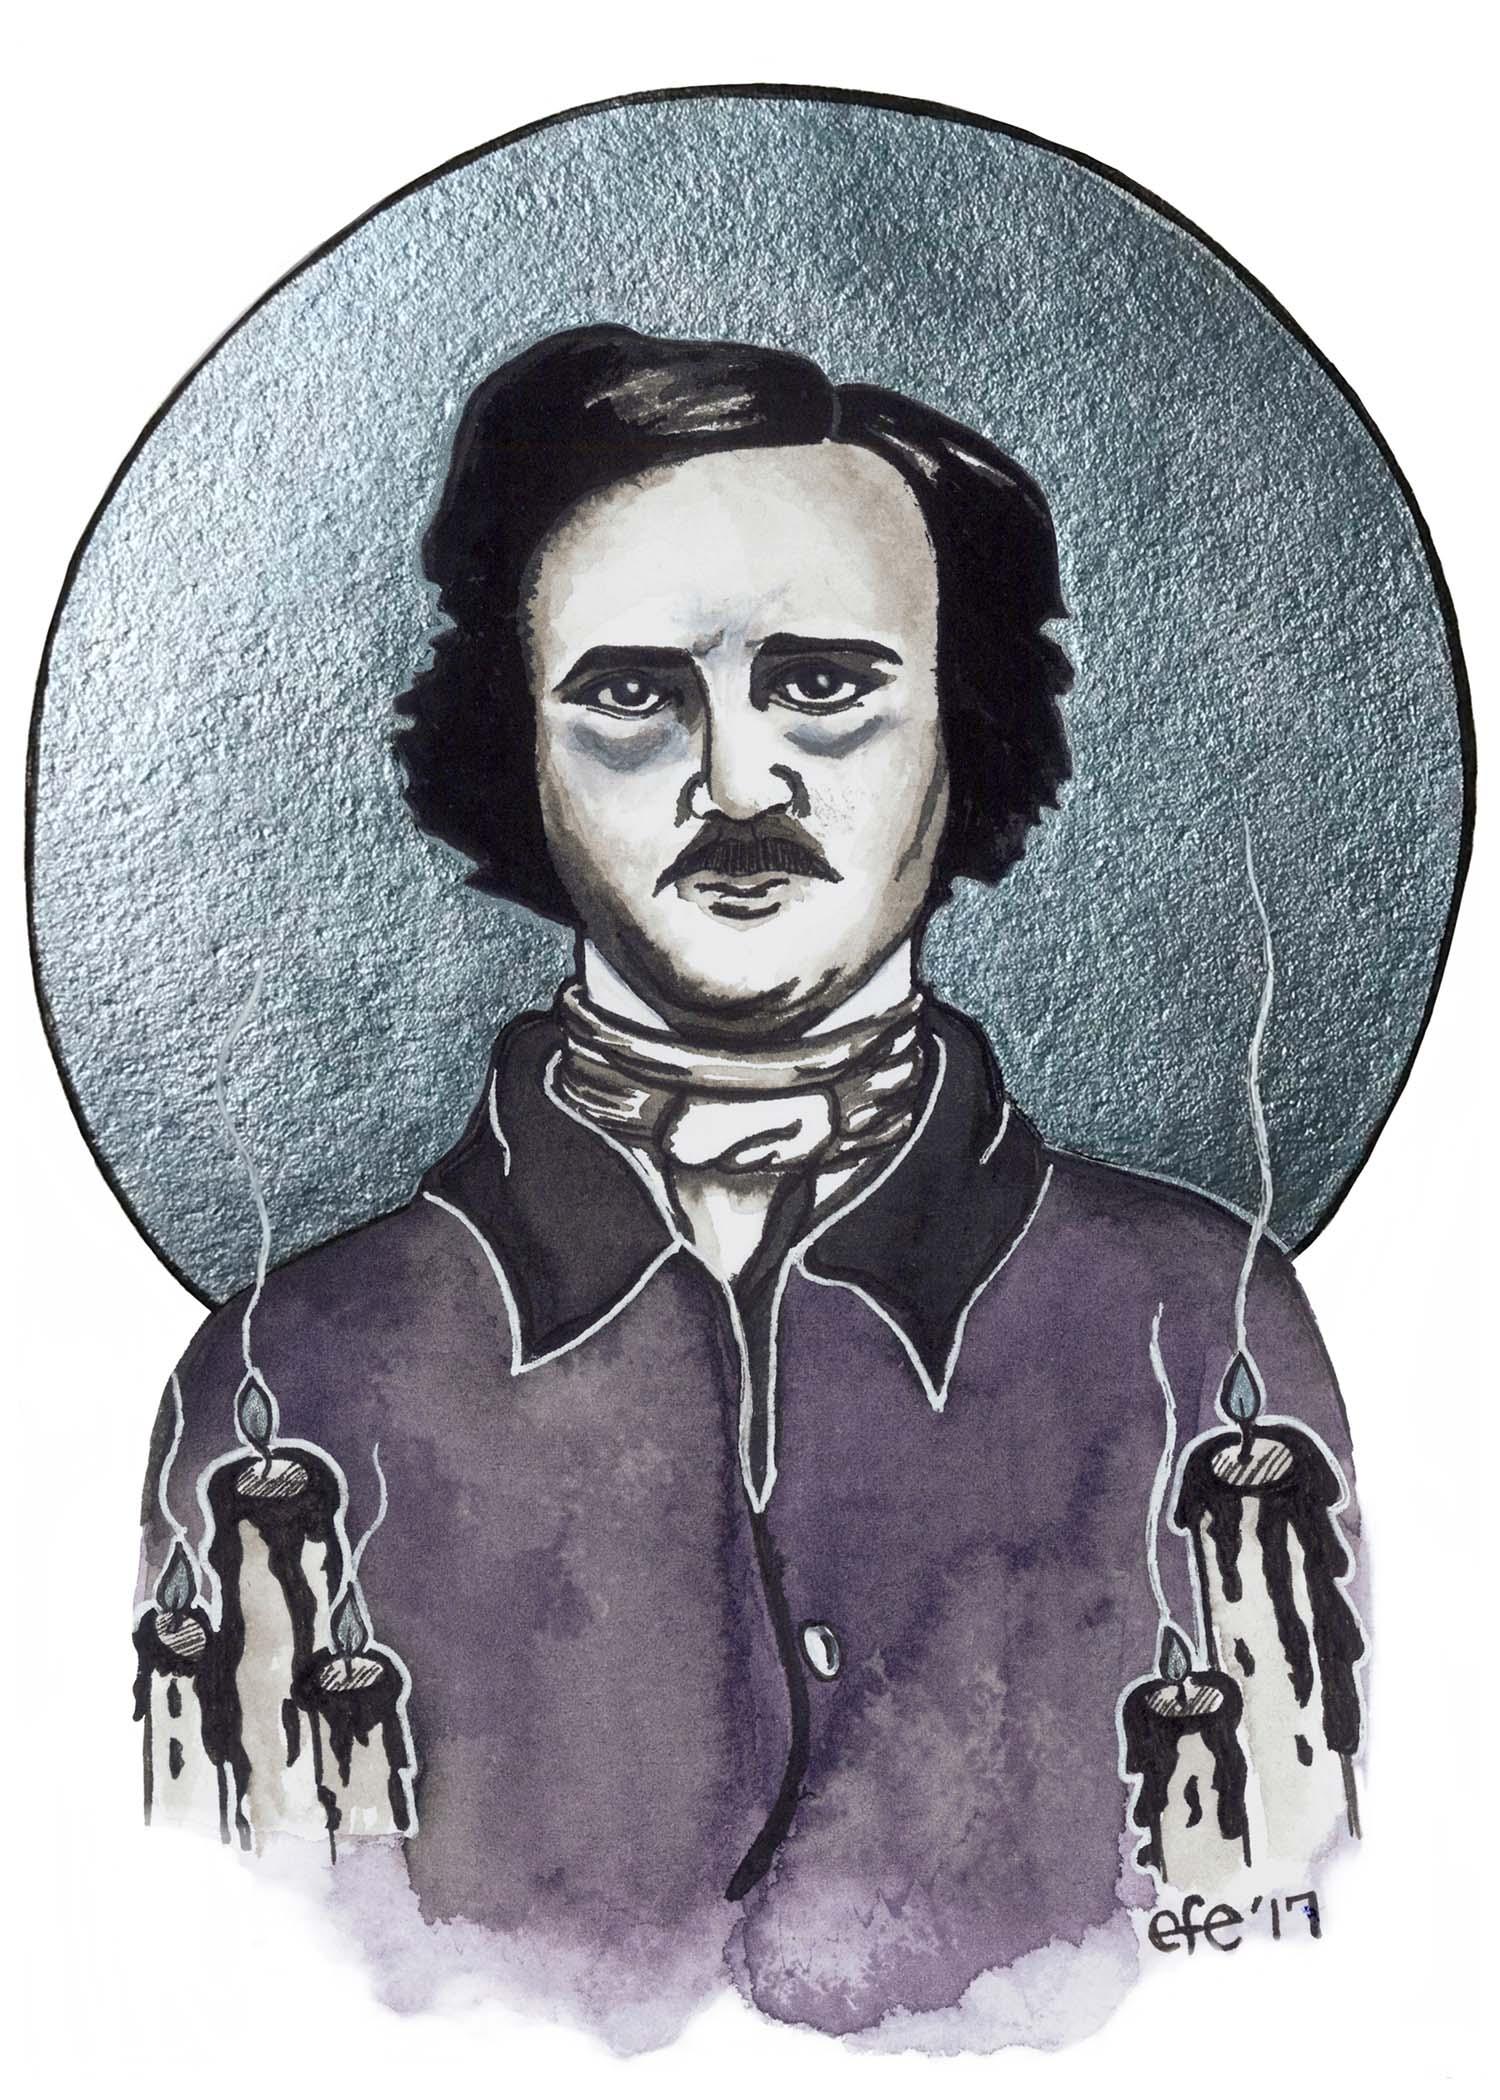 Day 01 - Edgar Allan Poe